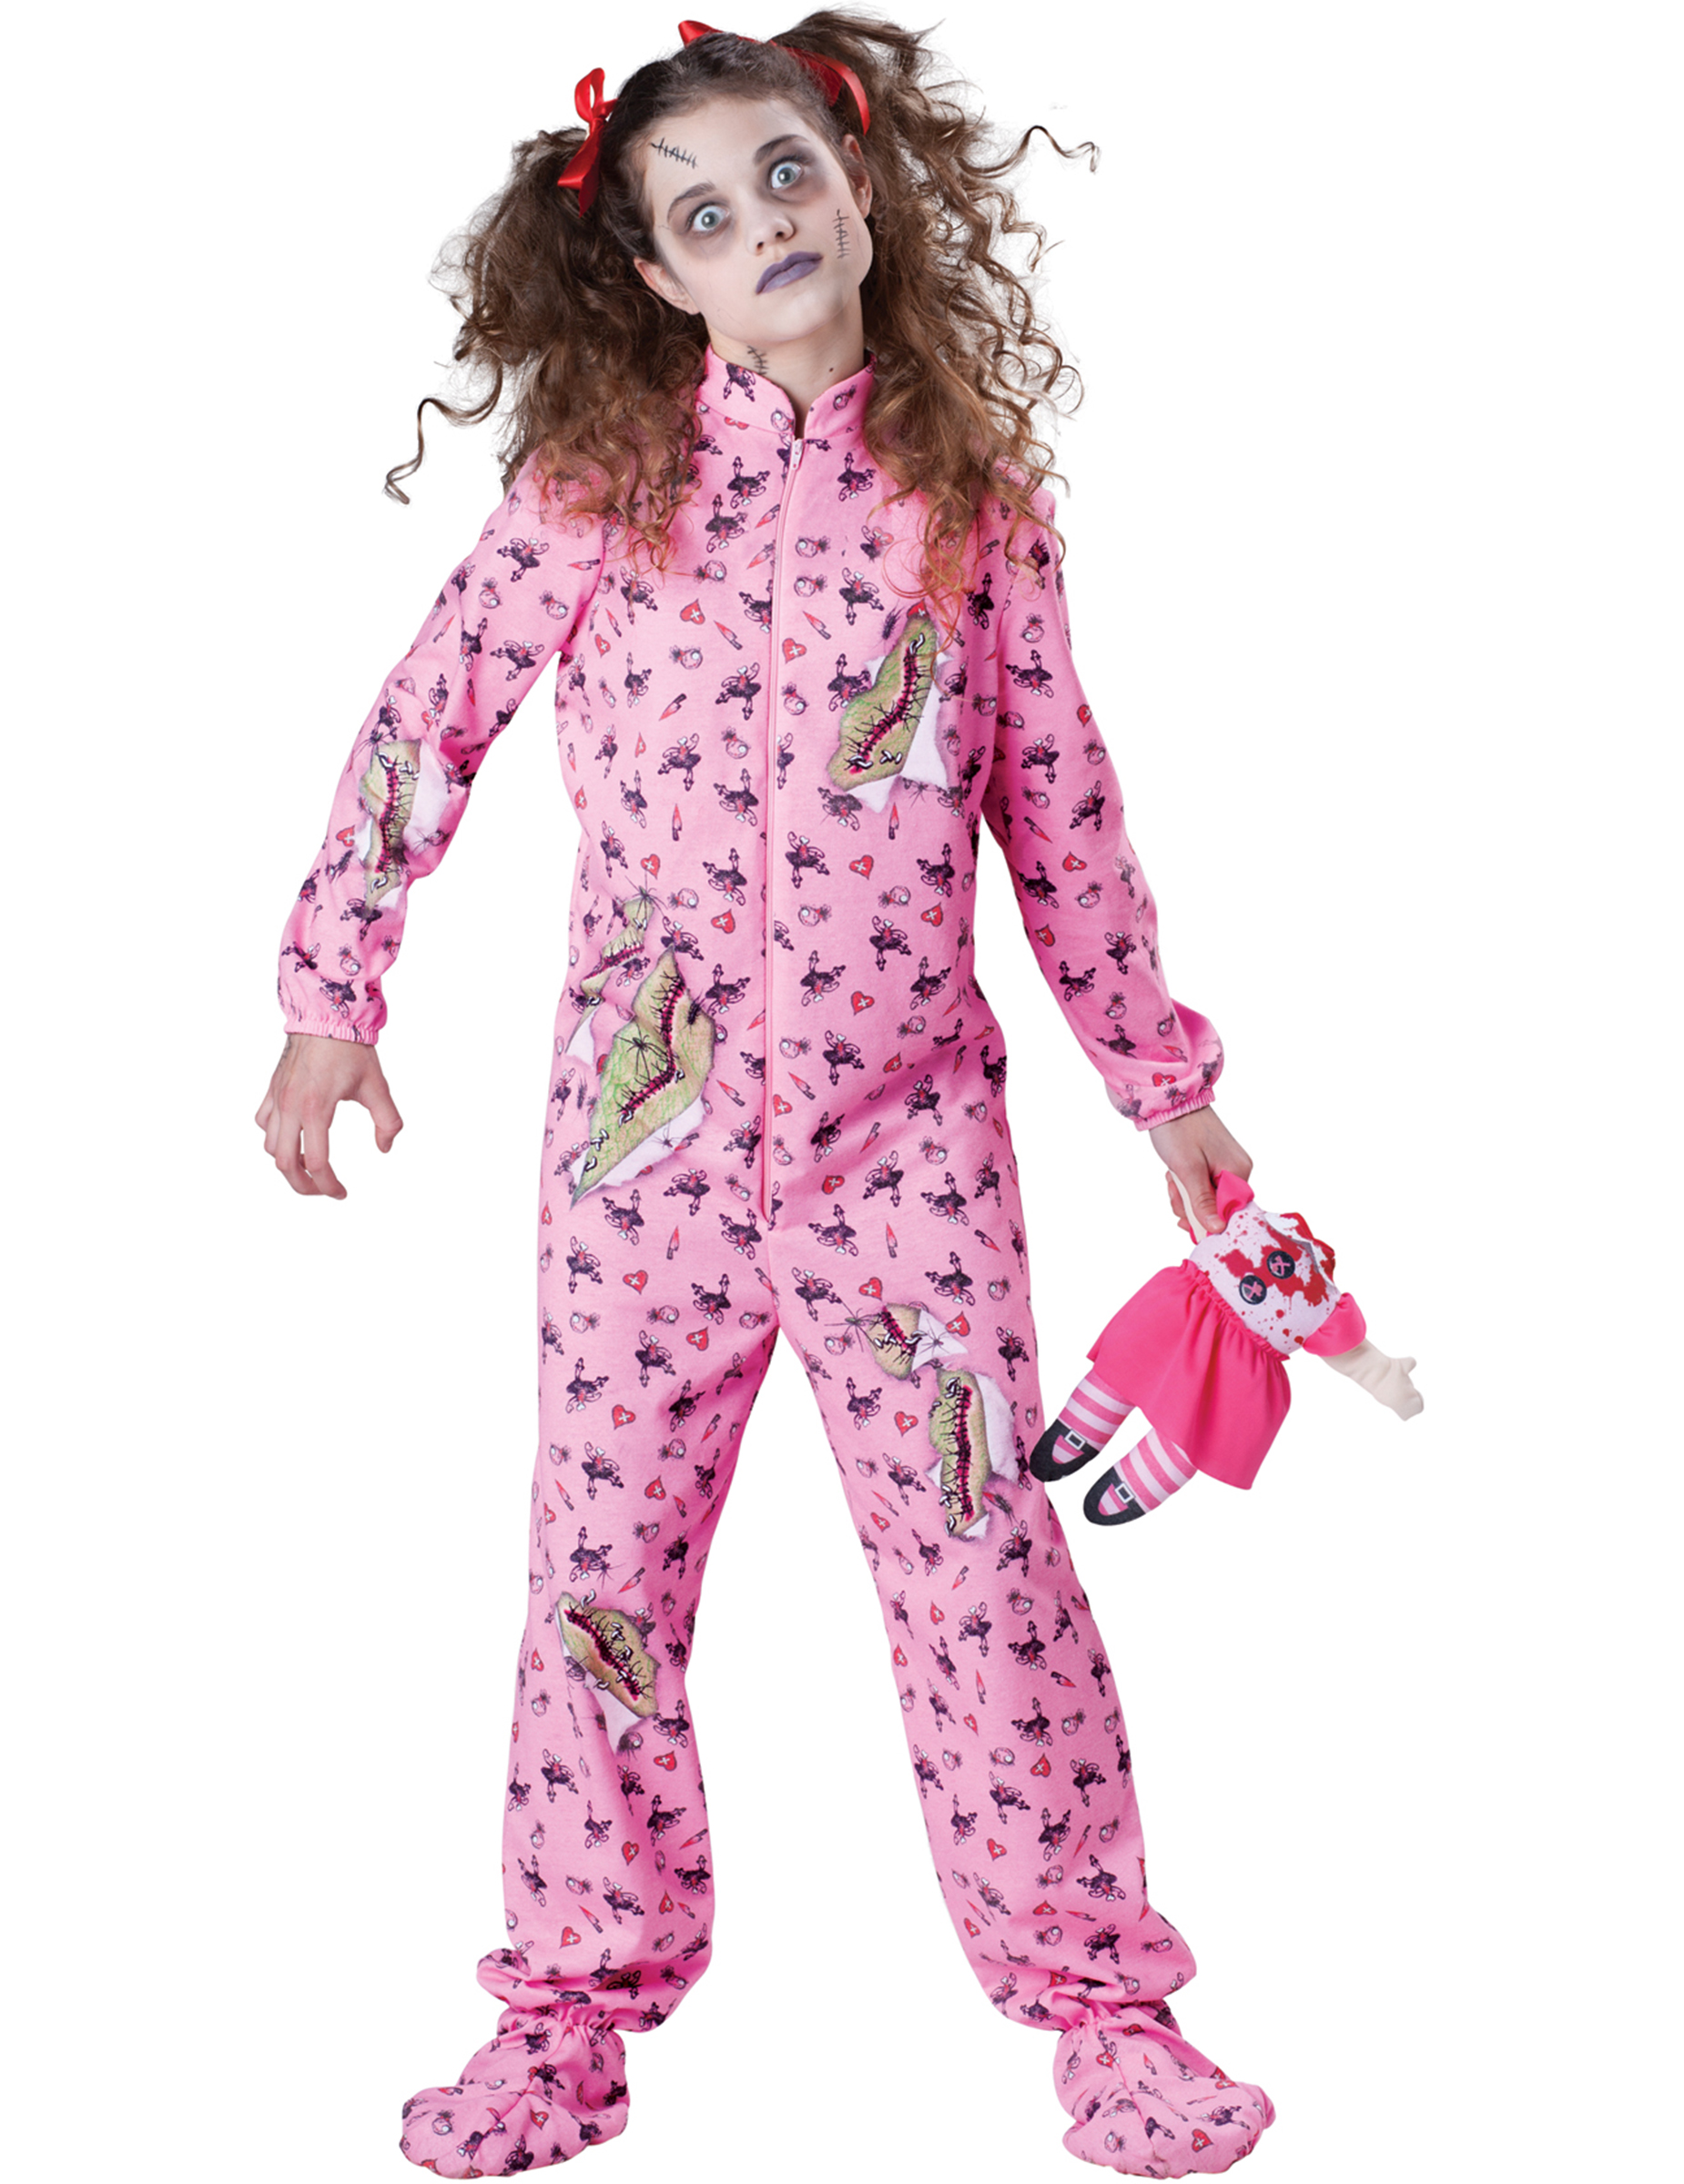 a158dda3373b30 Zombie-Schlafanzug Halloween Kinderkostüm pink-bunt , günstige ...